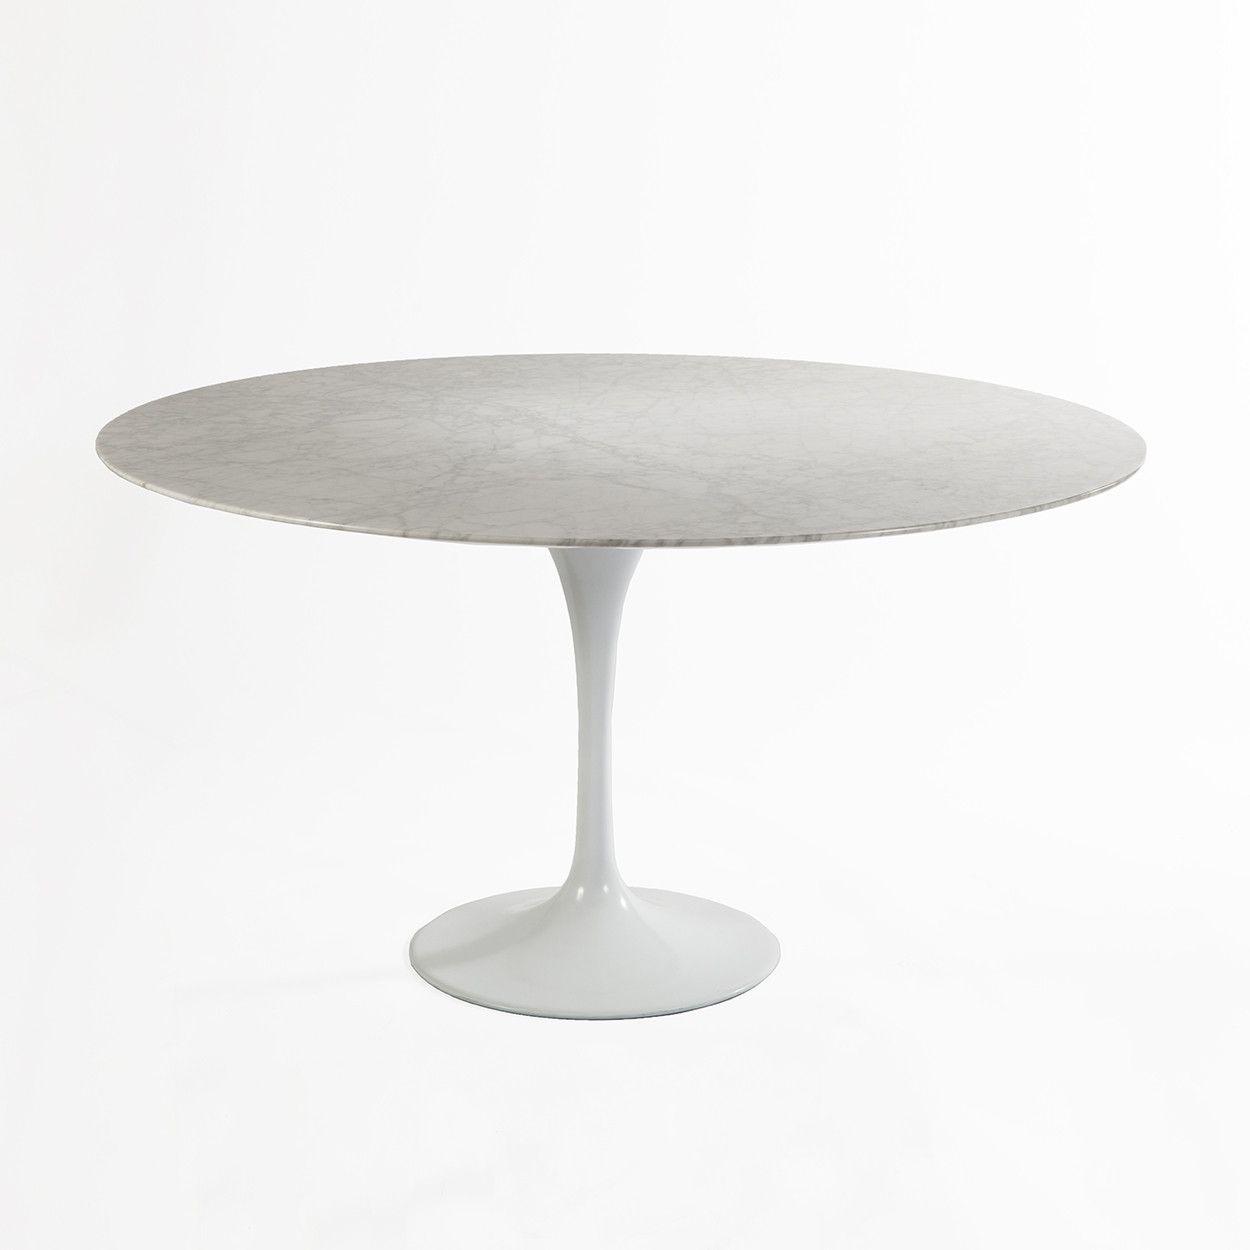 Mid Century Modern Reproduction Tulip Dining Table 60 Diameter Marble Inspired By Eero Saarinen